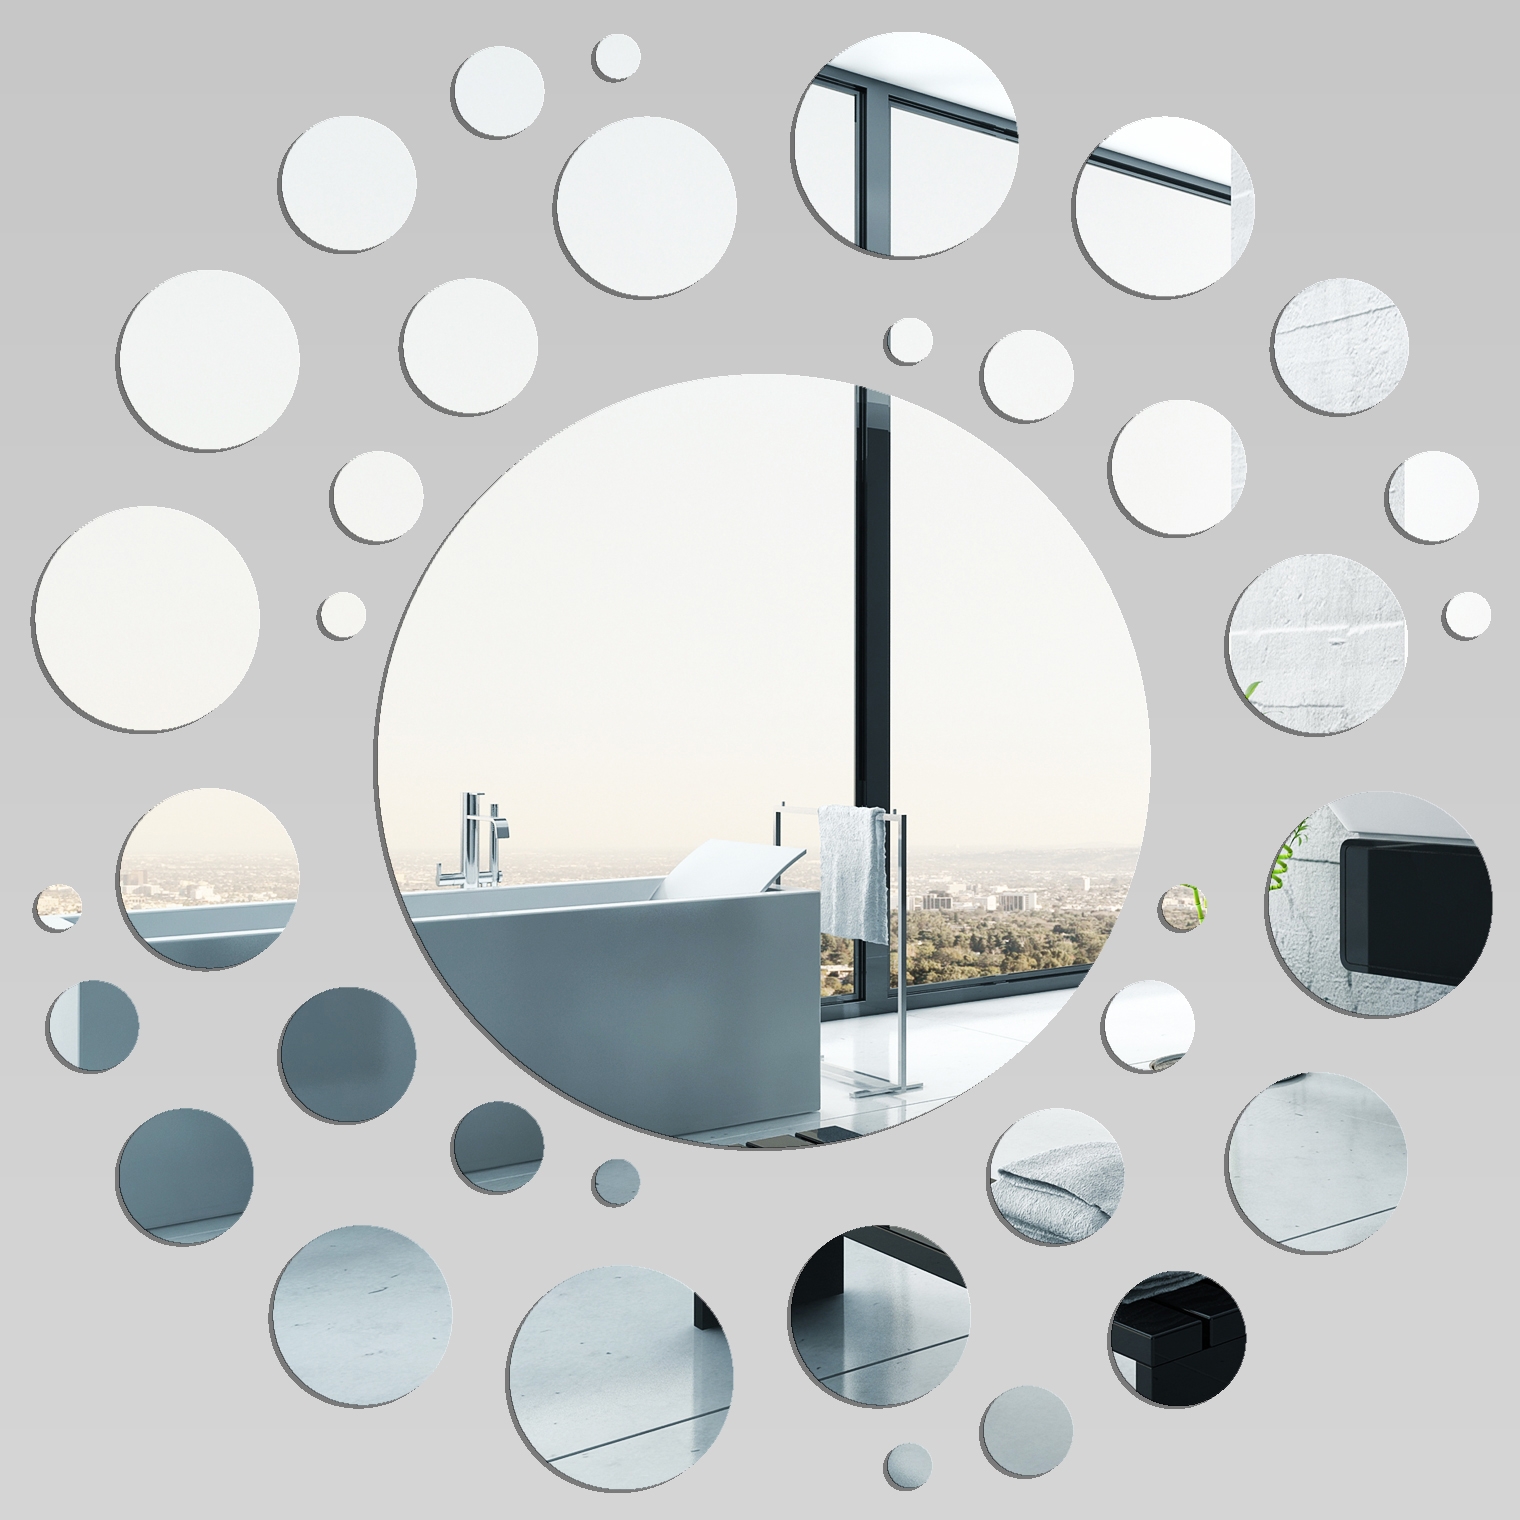 Miroir plexiglass acrylique spirale 2 pas cher for Miroir 90x90